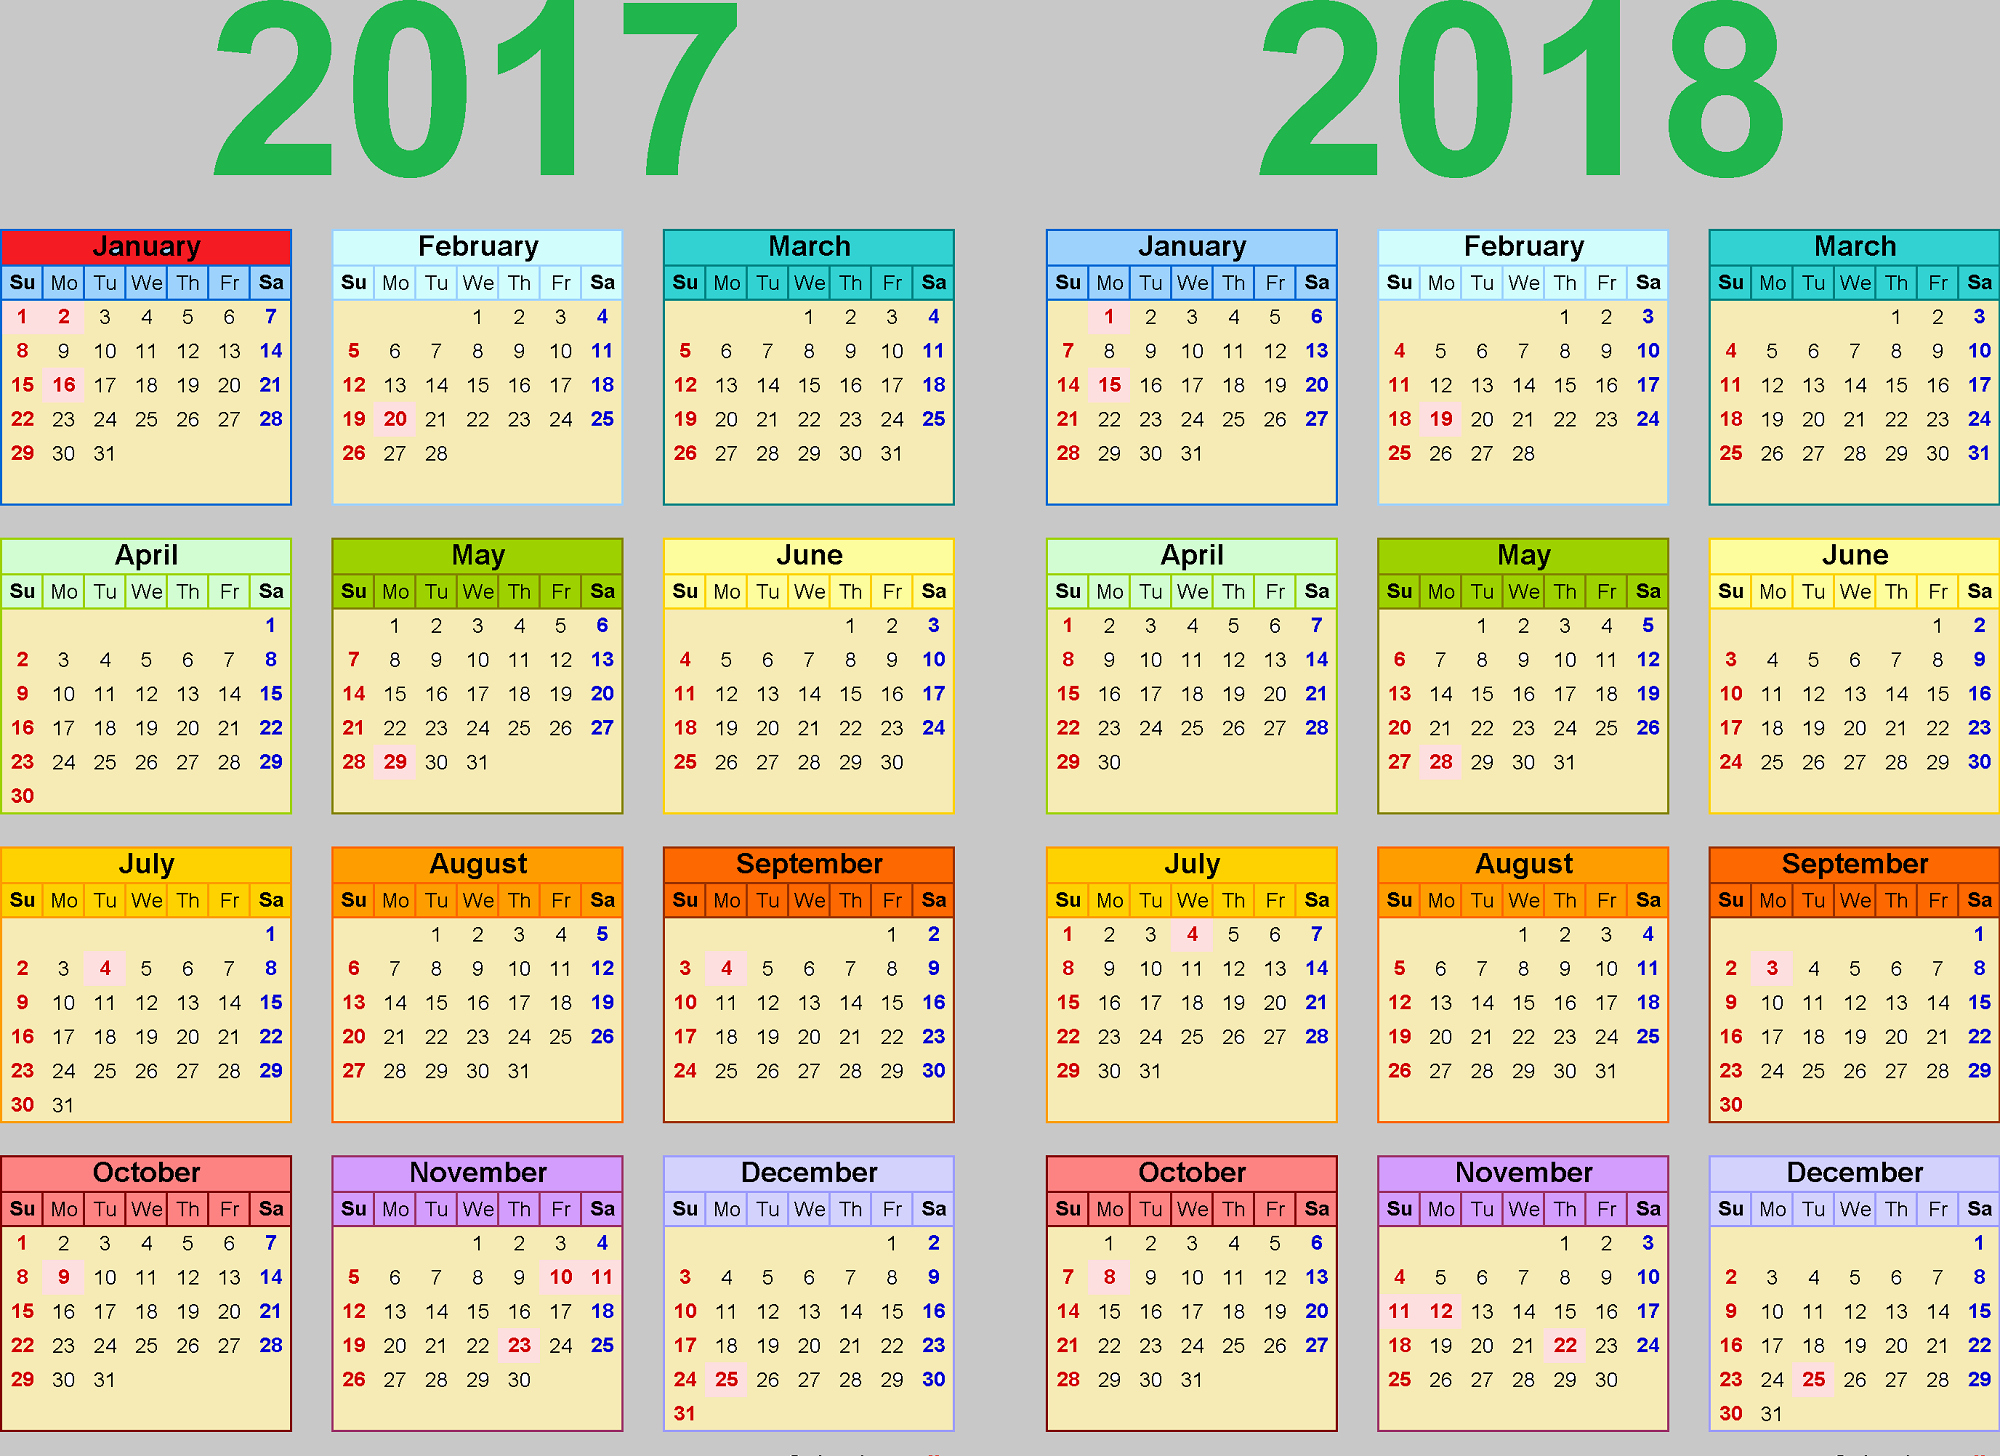 2017-2018 Printable Calendar Luxury 2017 2018 Printable Calendars